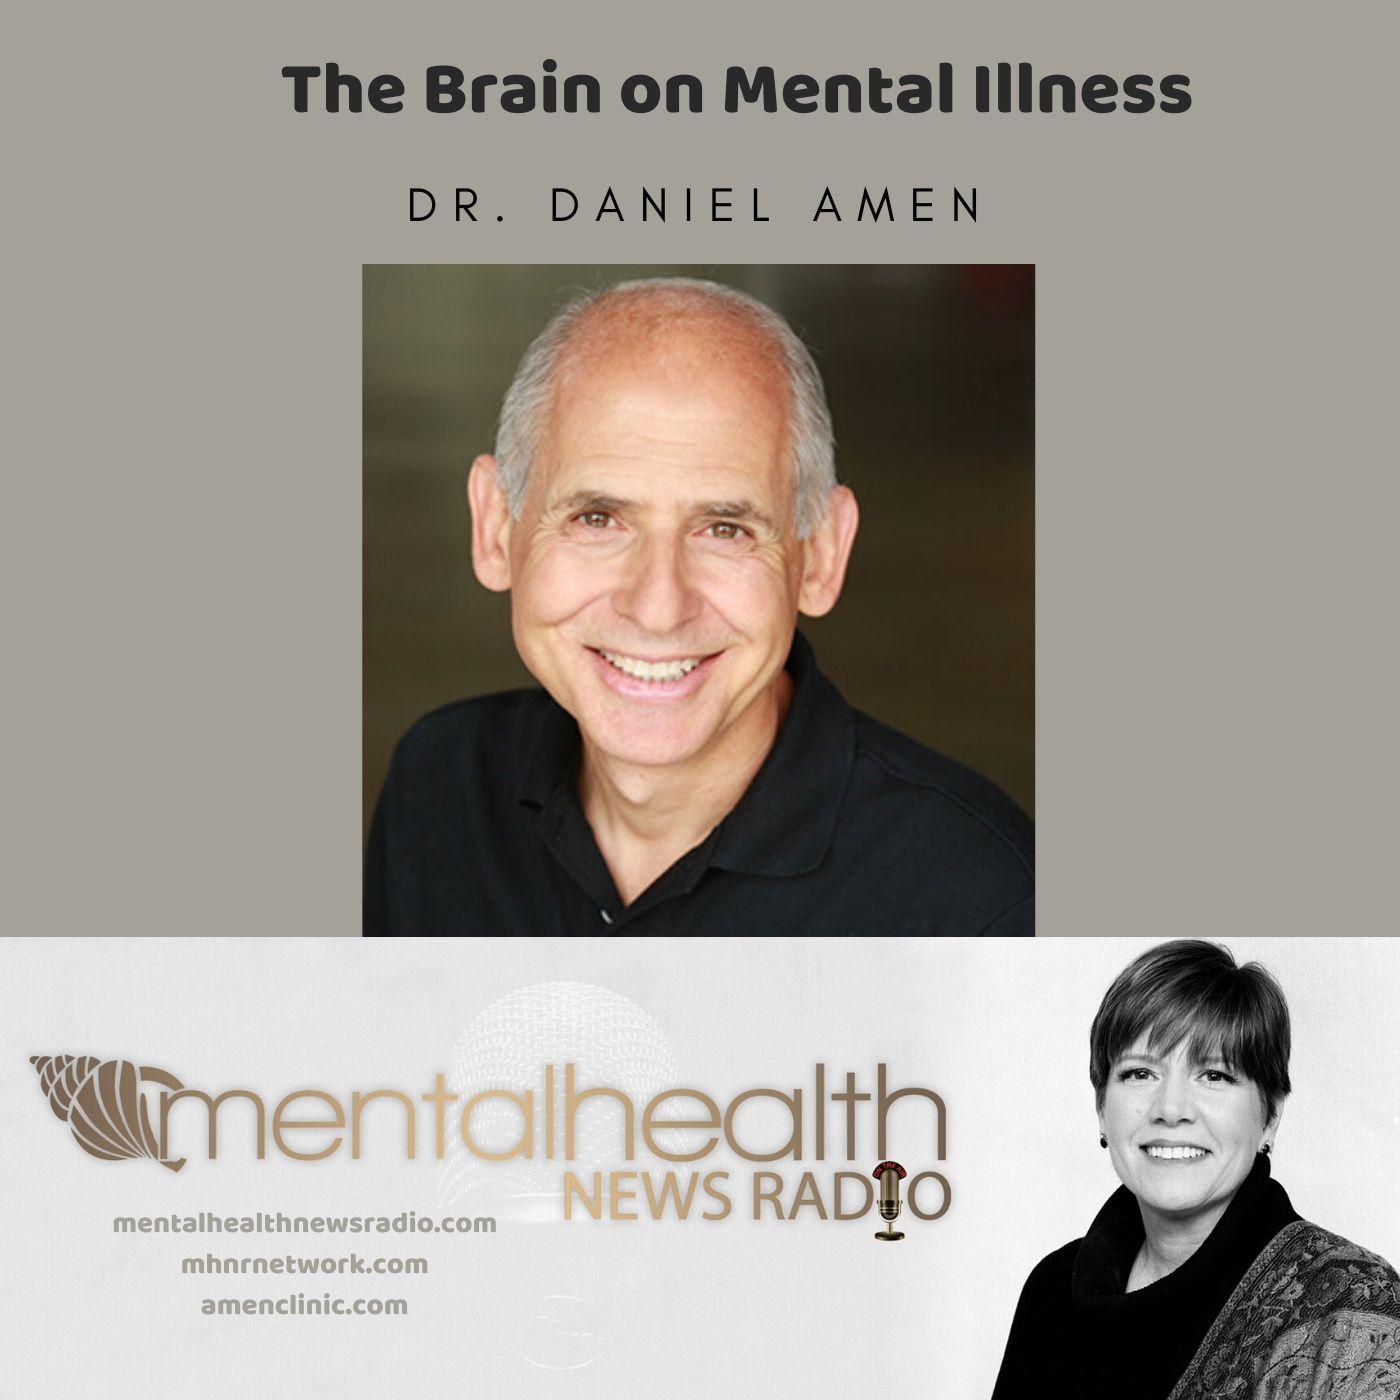 Mental Health News Radio - The Brain On Mental Illness